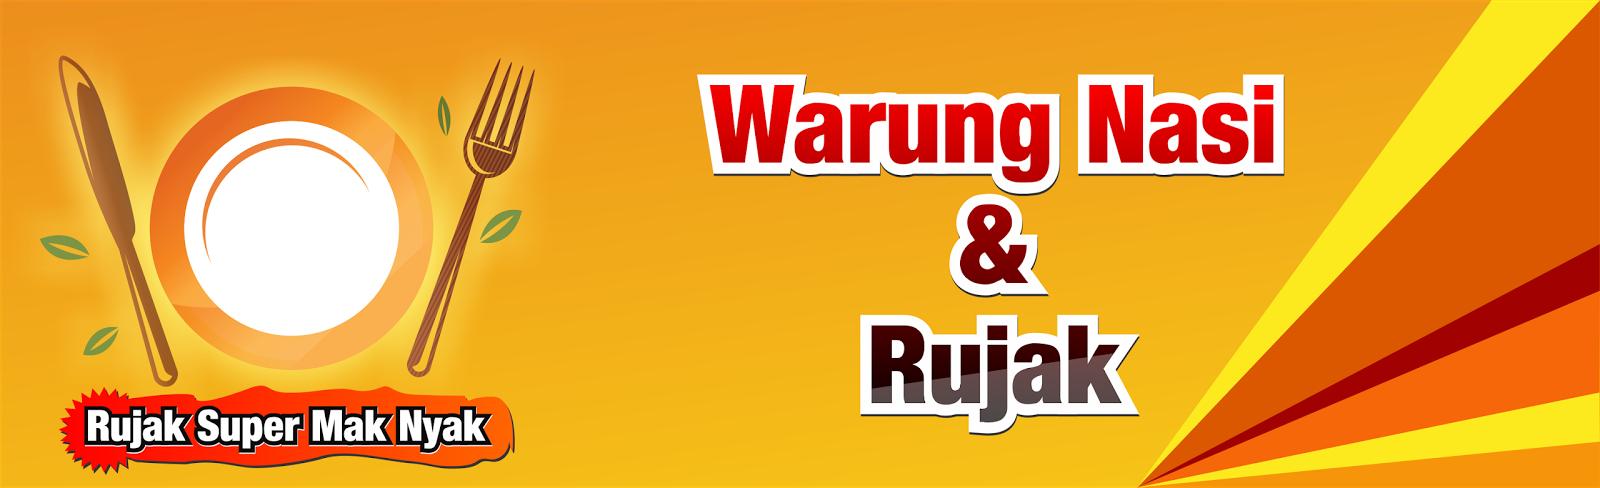 Background Banner Makanan Cdr - Best Banner Design 2018